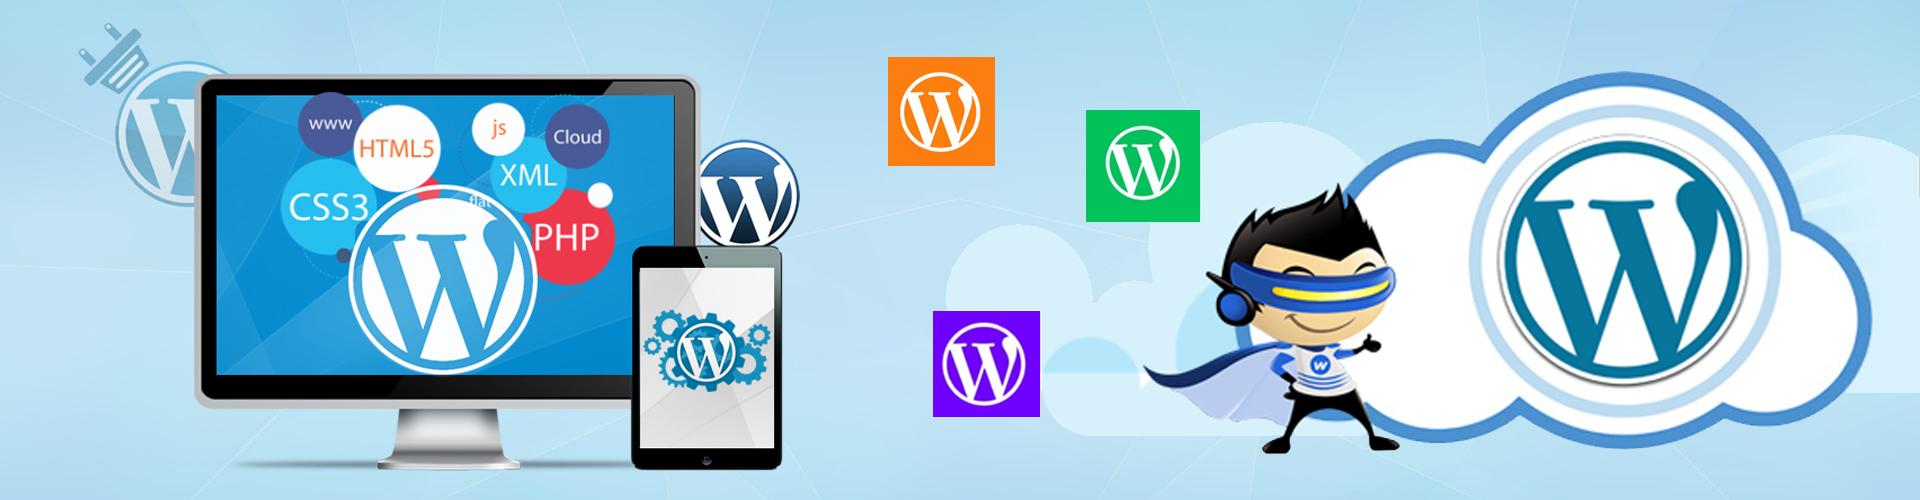 WordPress Development Services - Sigma Solve Inc.